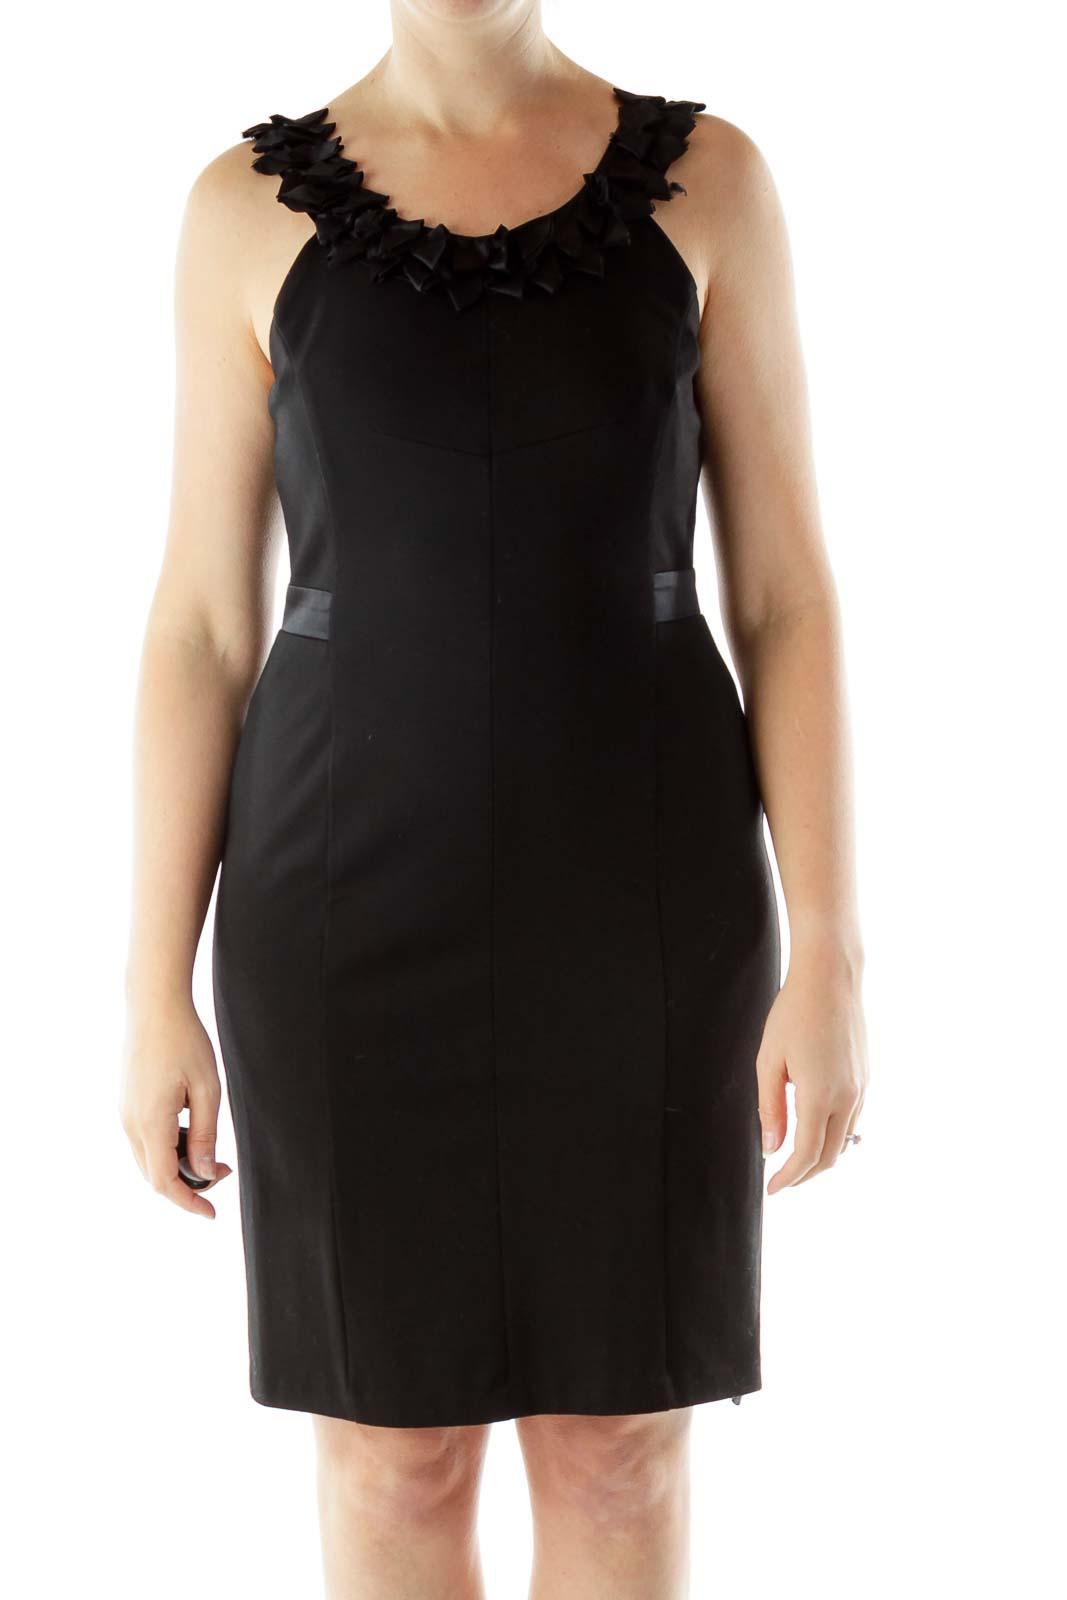 Black Cocktail Dress Front